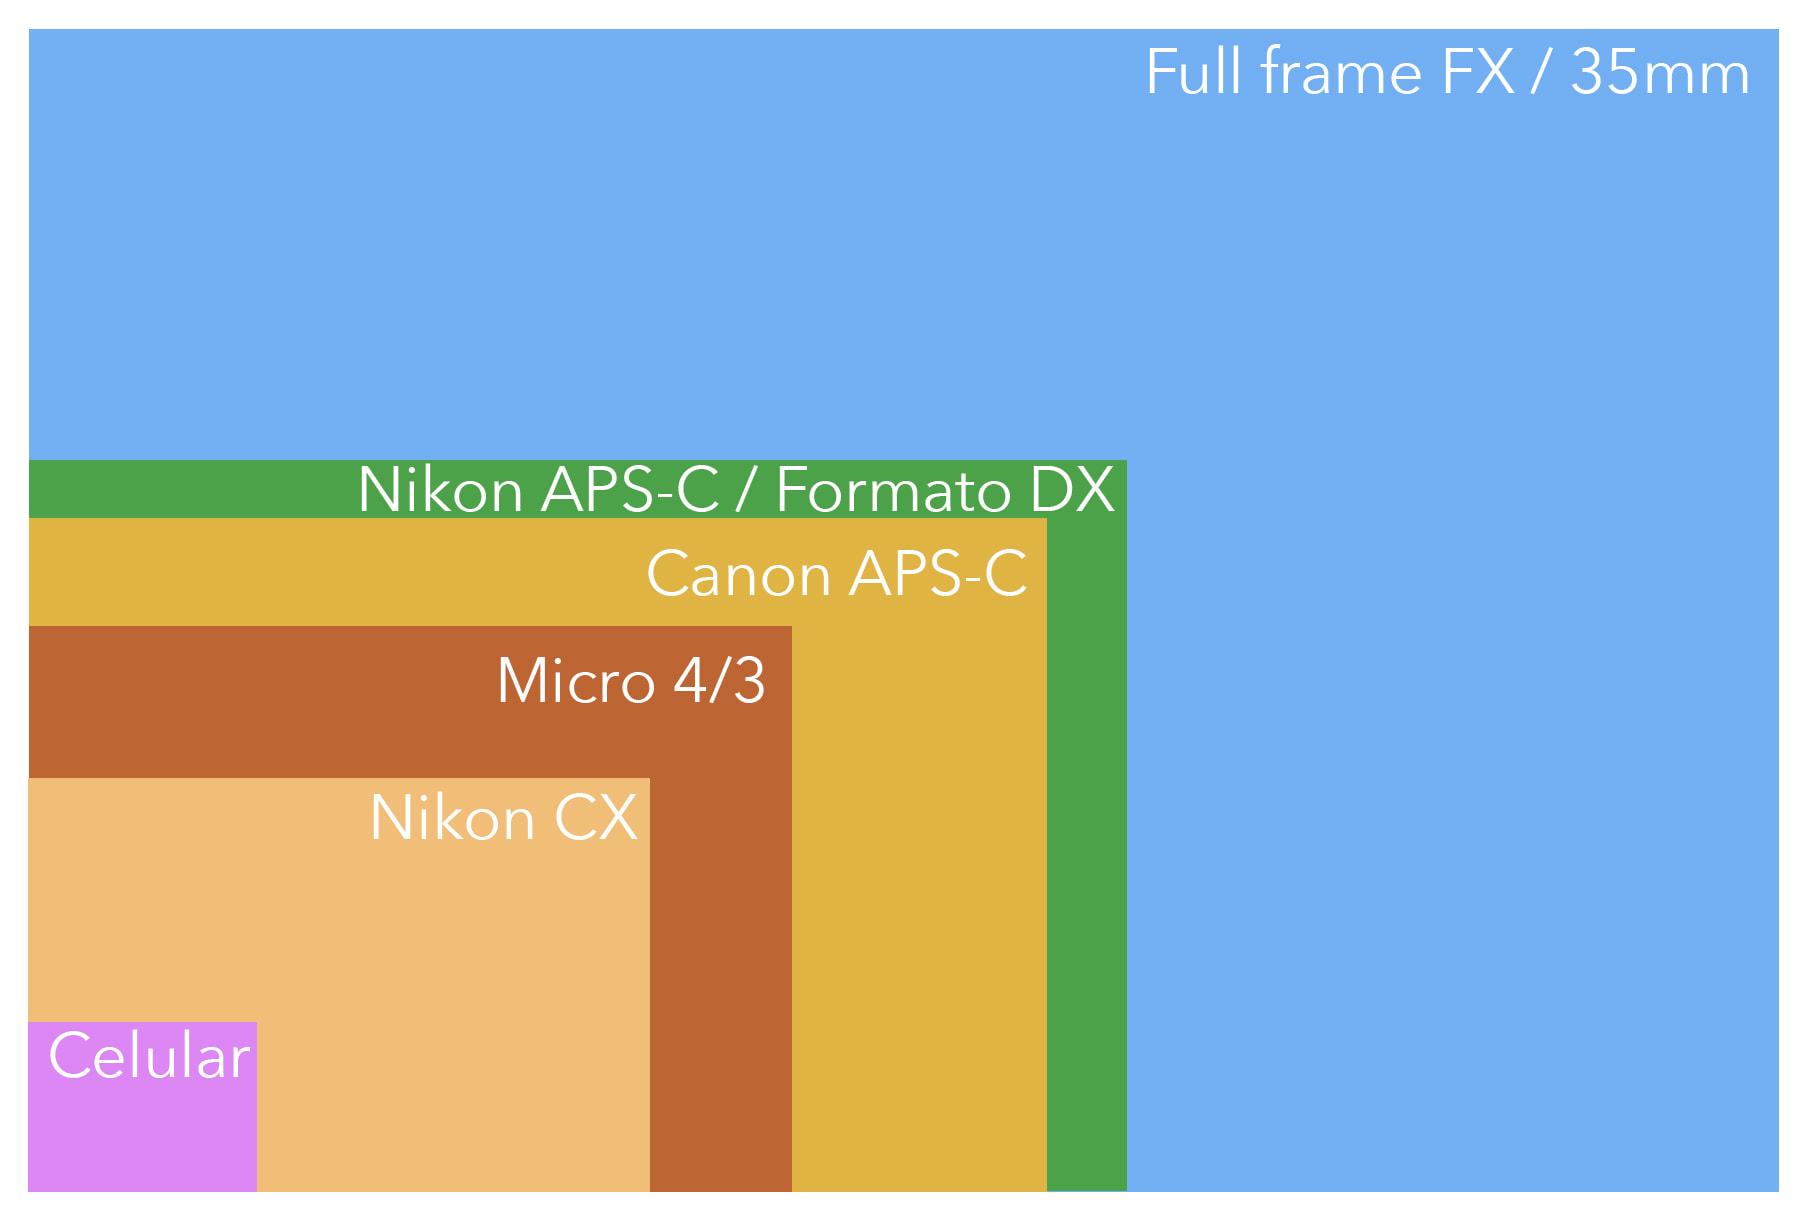 Diferencias entre sensores